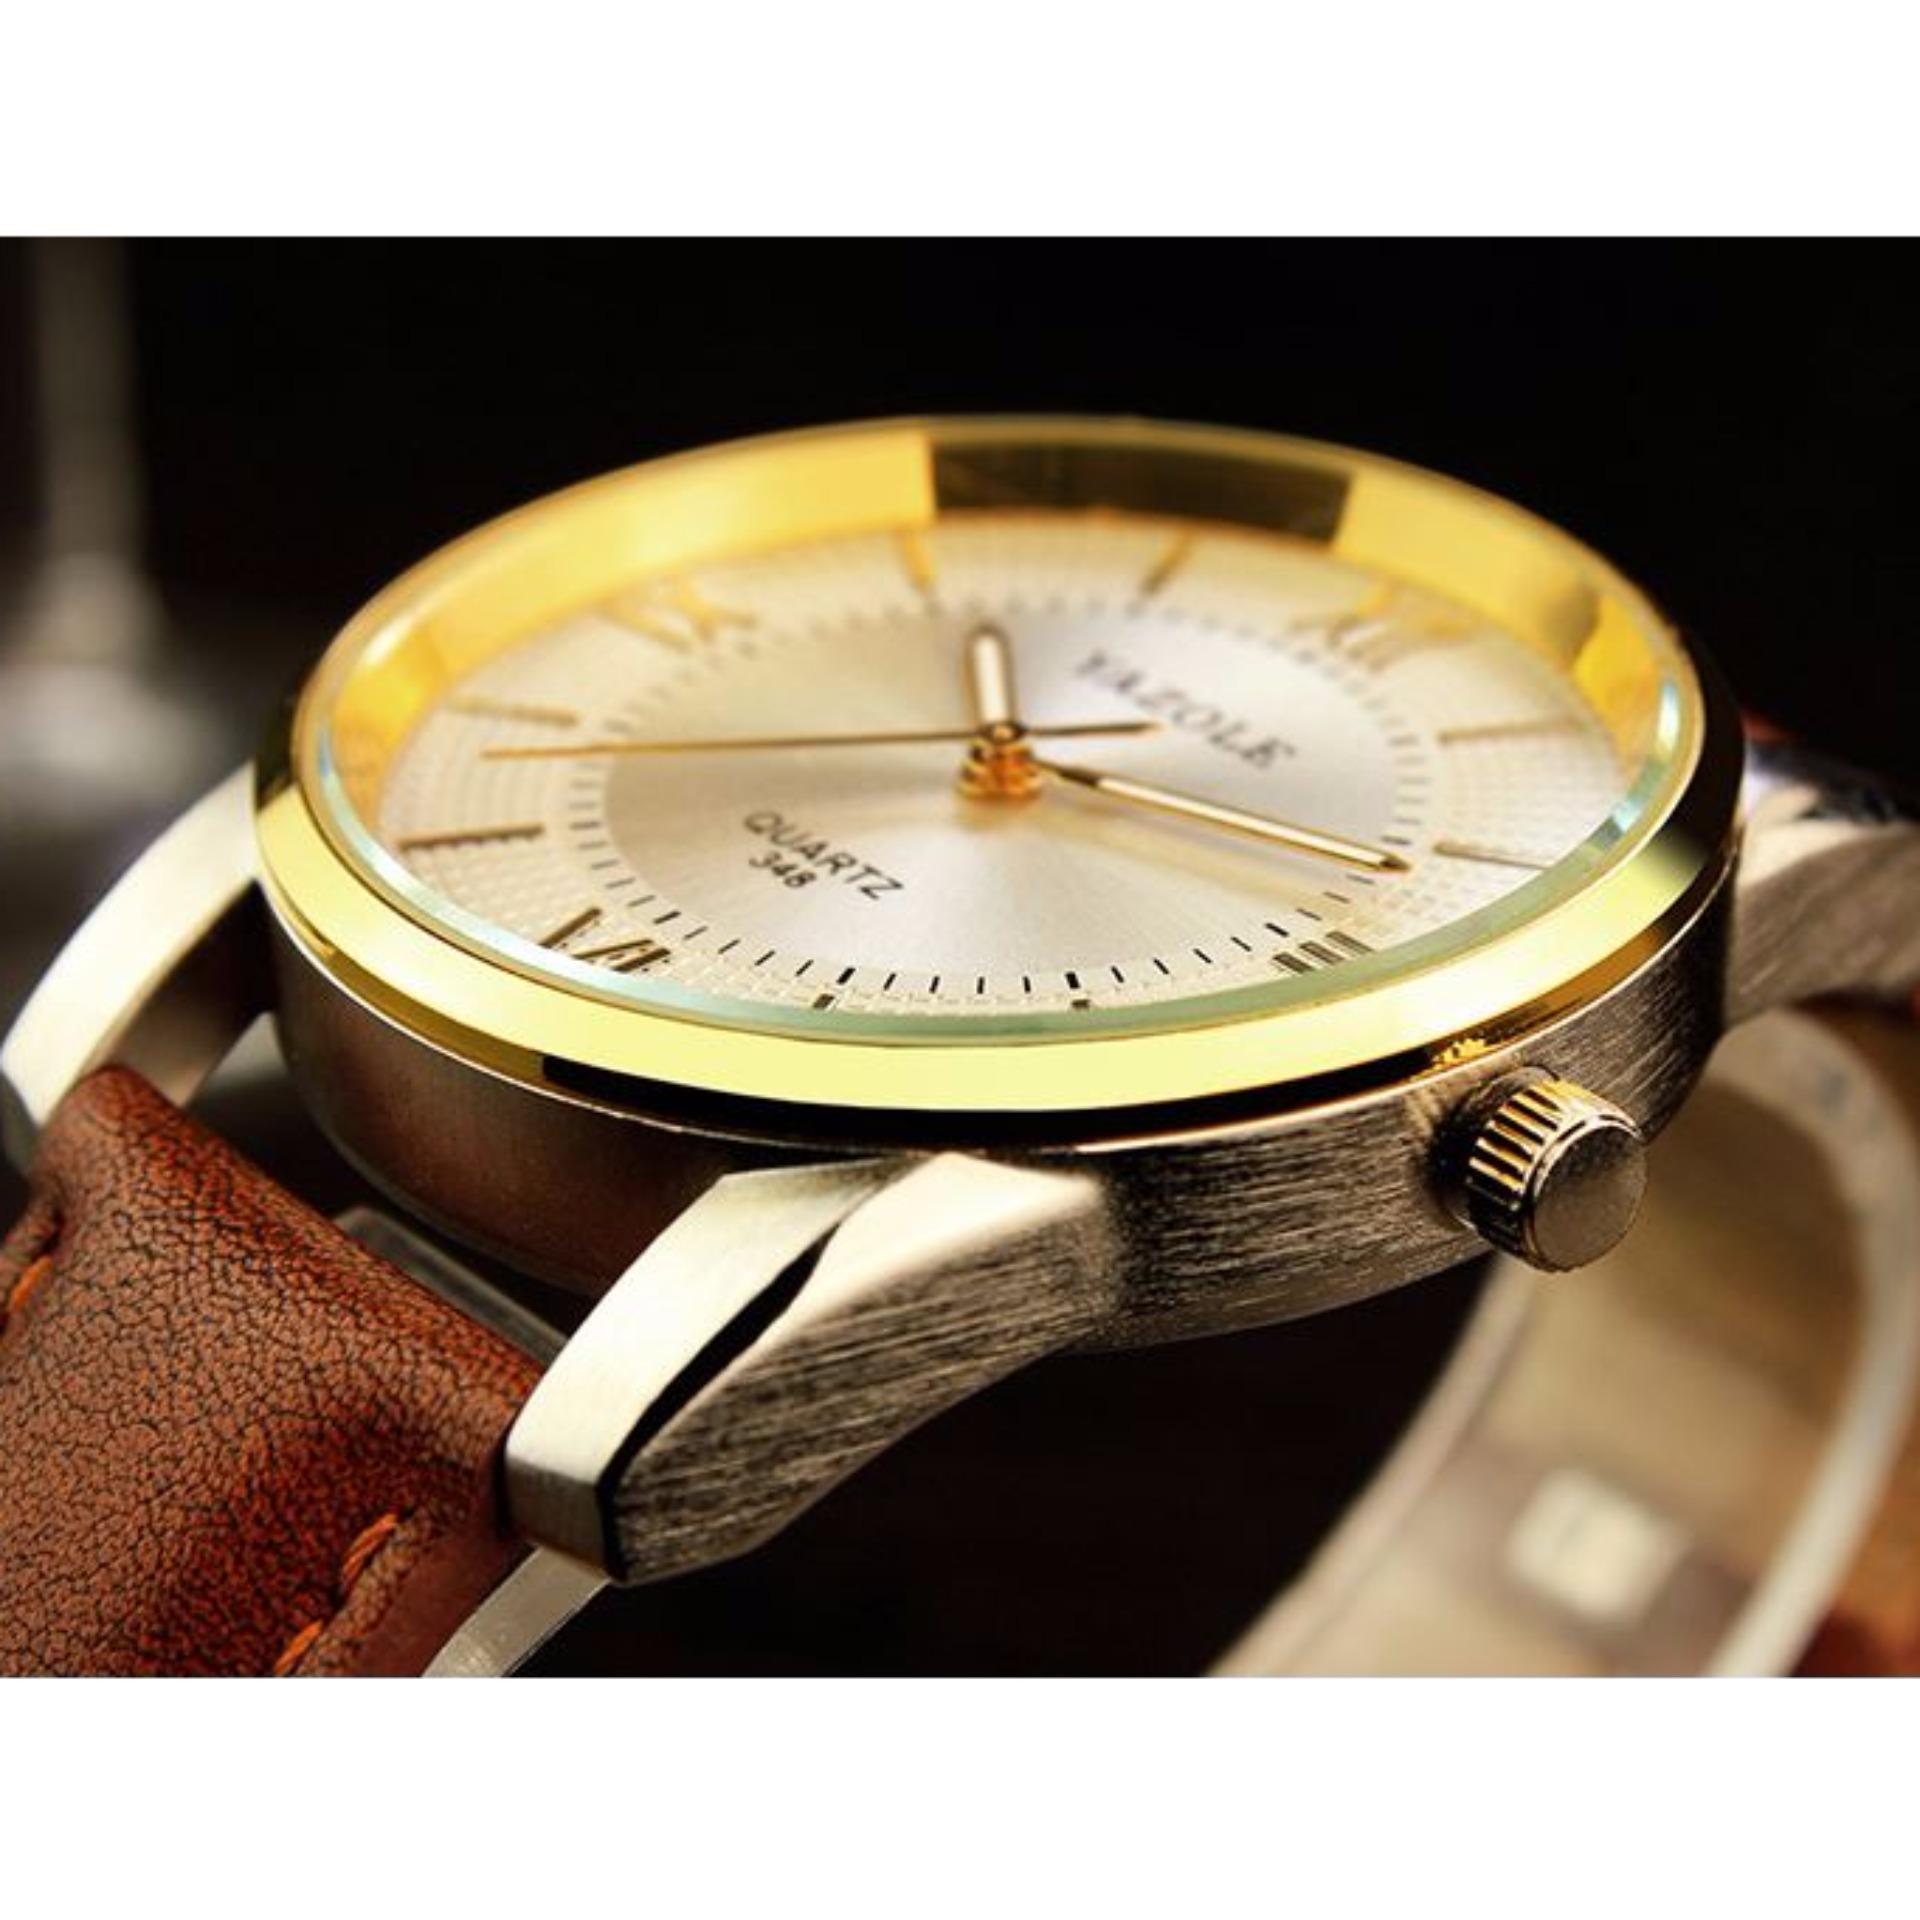 Yazole Jam Tangan Pria Sport Fashion Quartz Wristwatches 372 Black 296 Original Business Watches Dial 348 White Brown